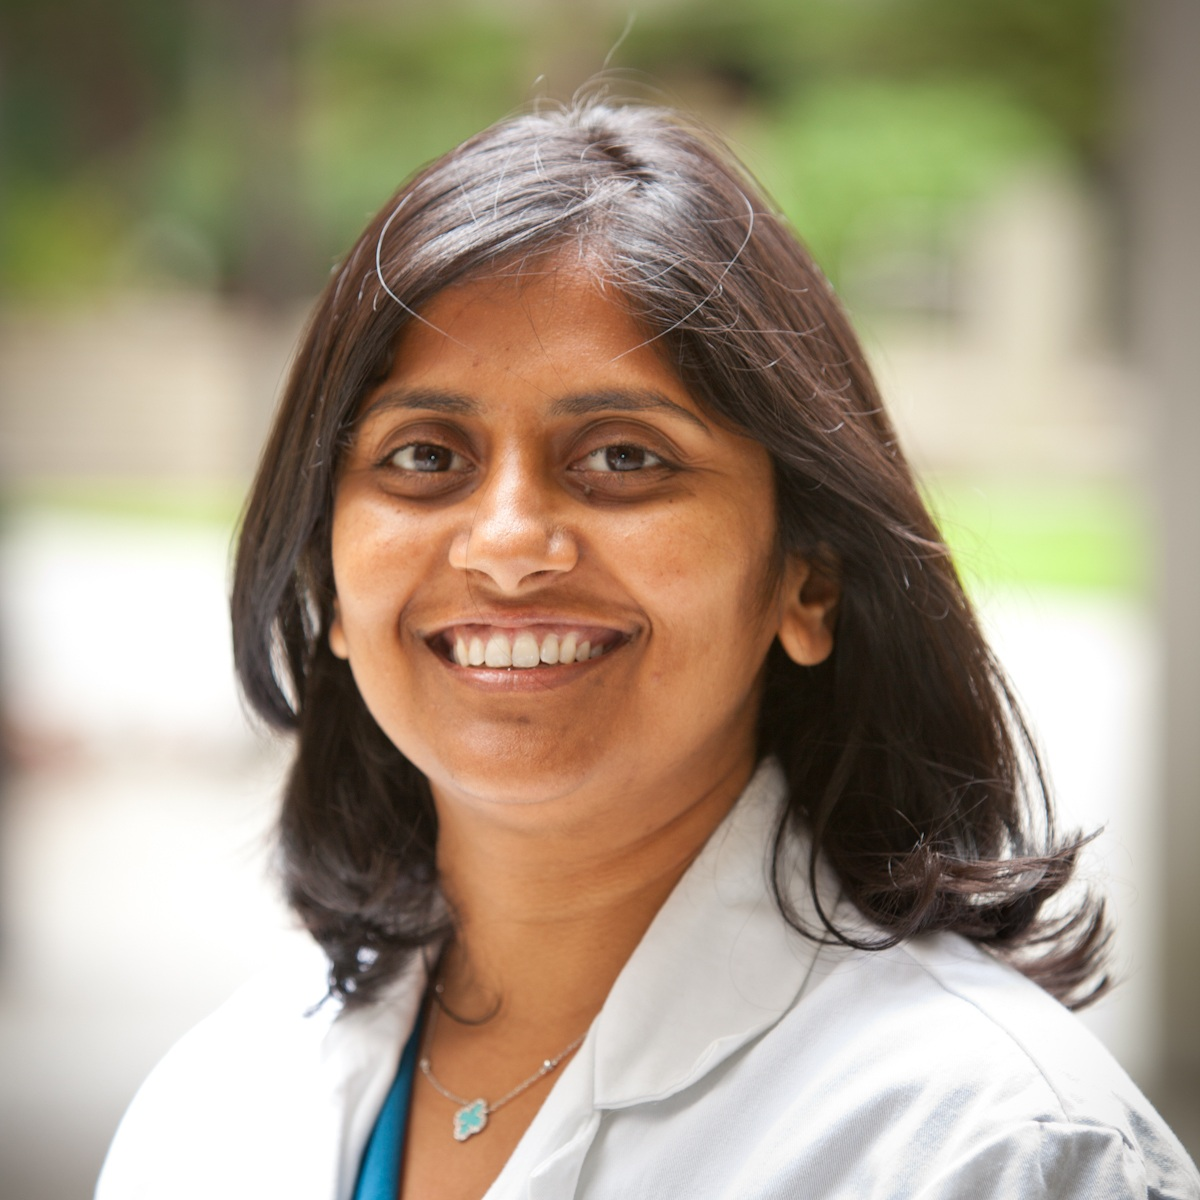 Madhavi Dandu, M.D. | Director   Professor of Medicine, UCSF